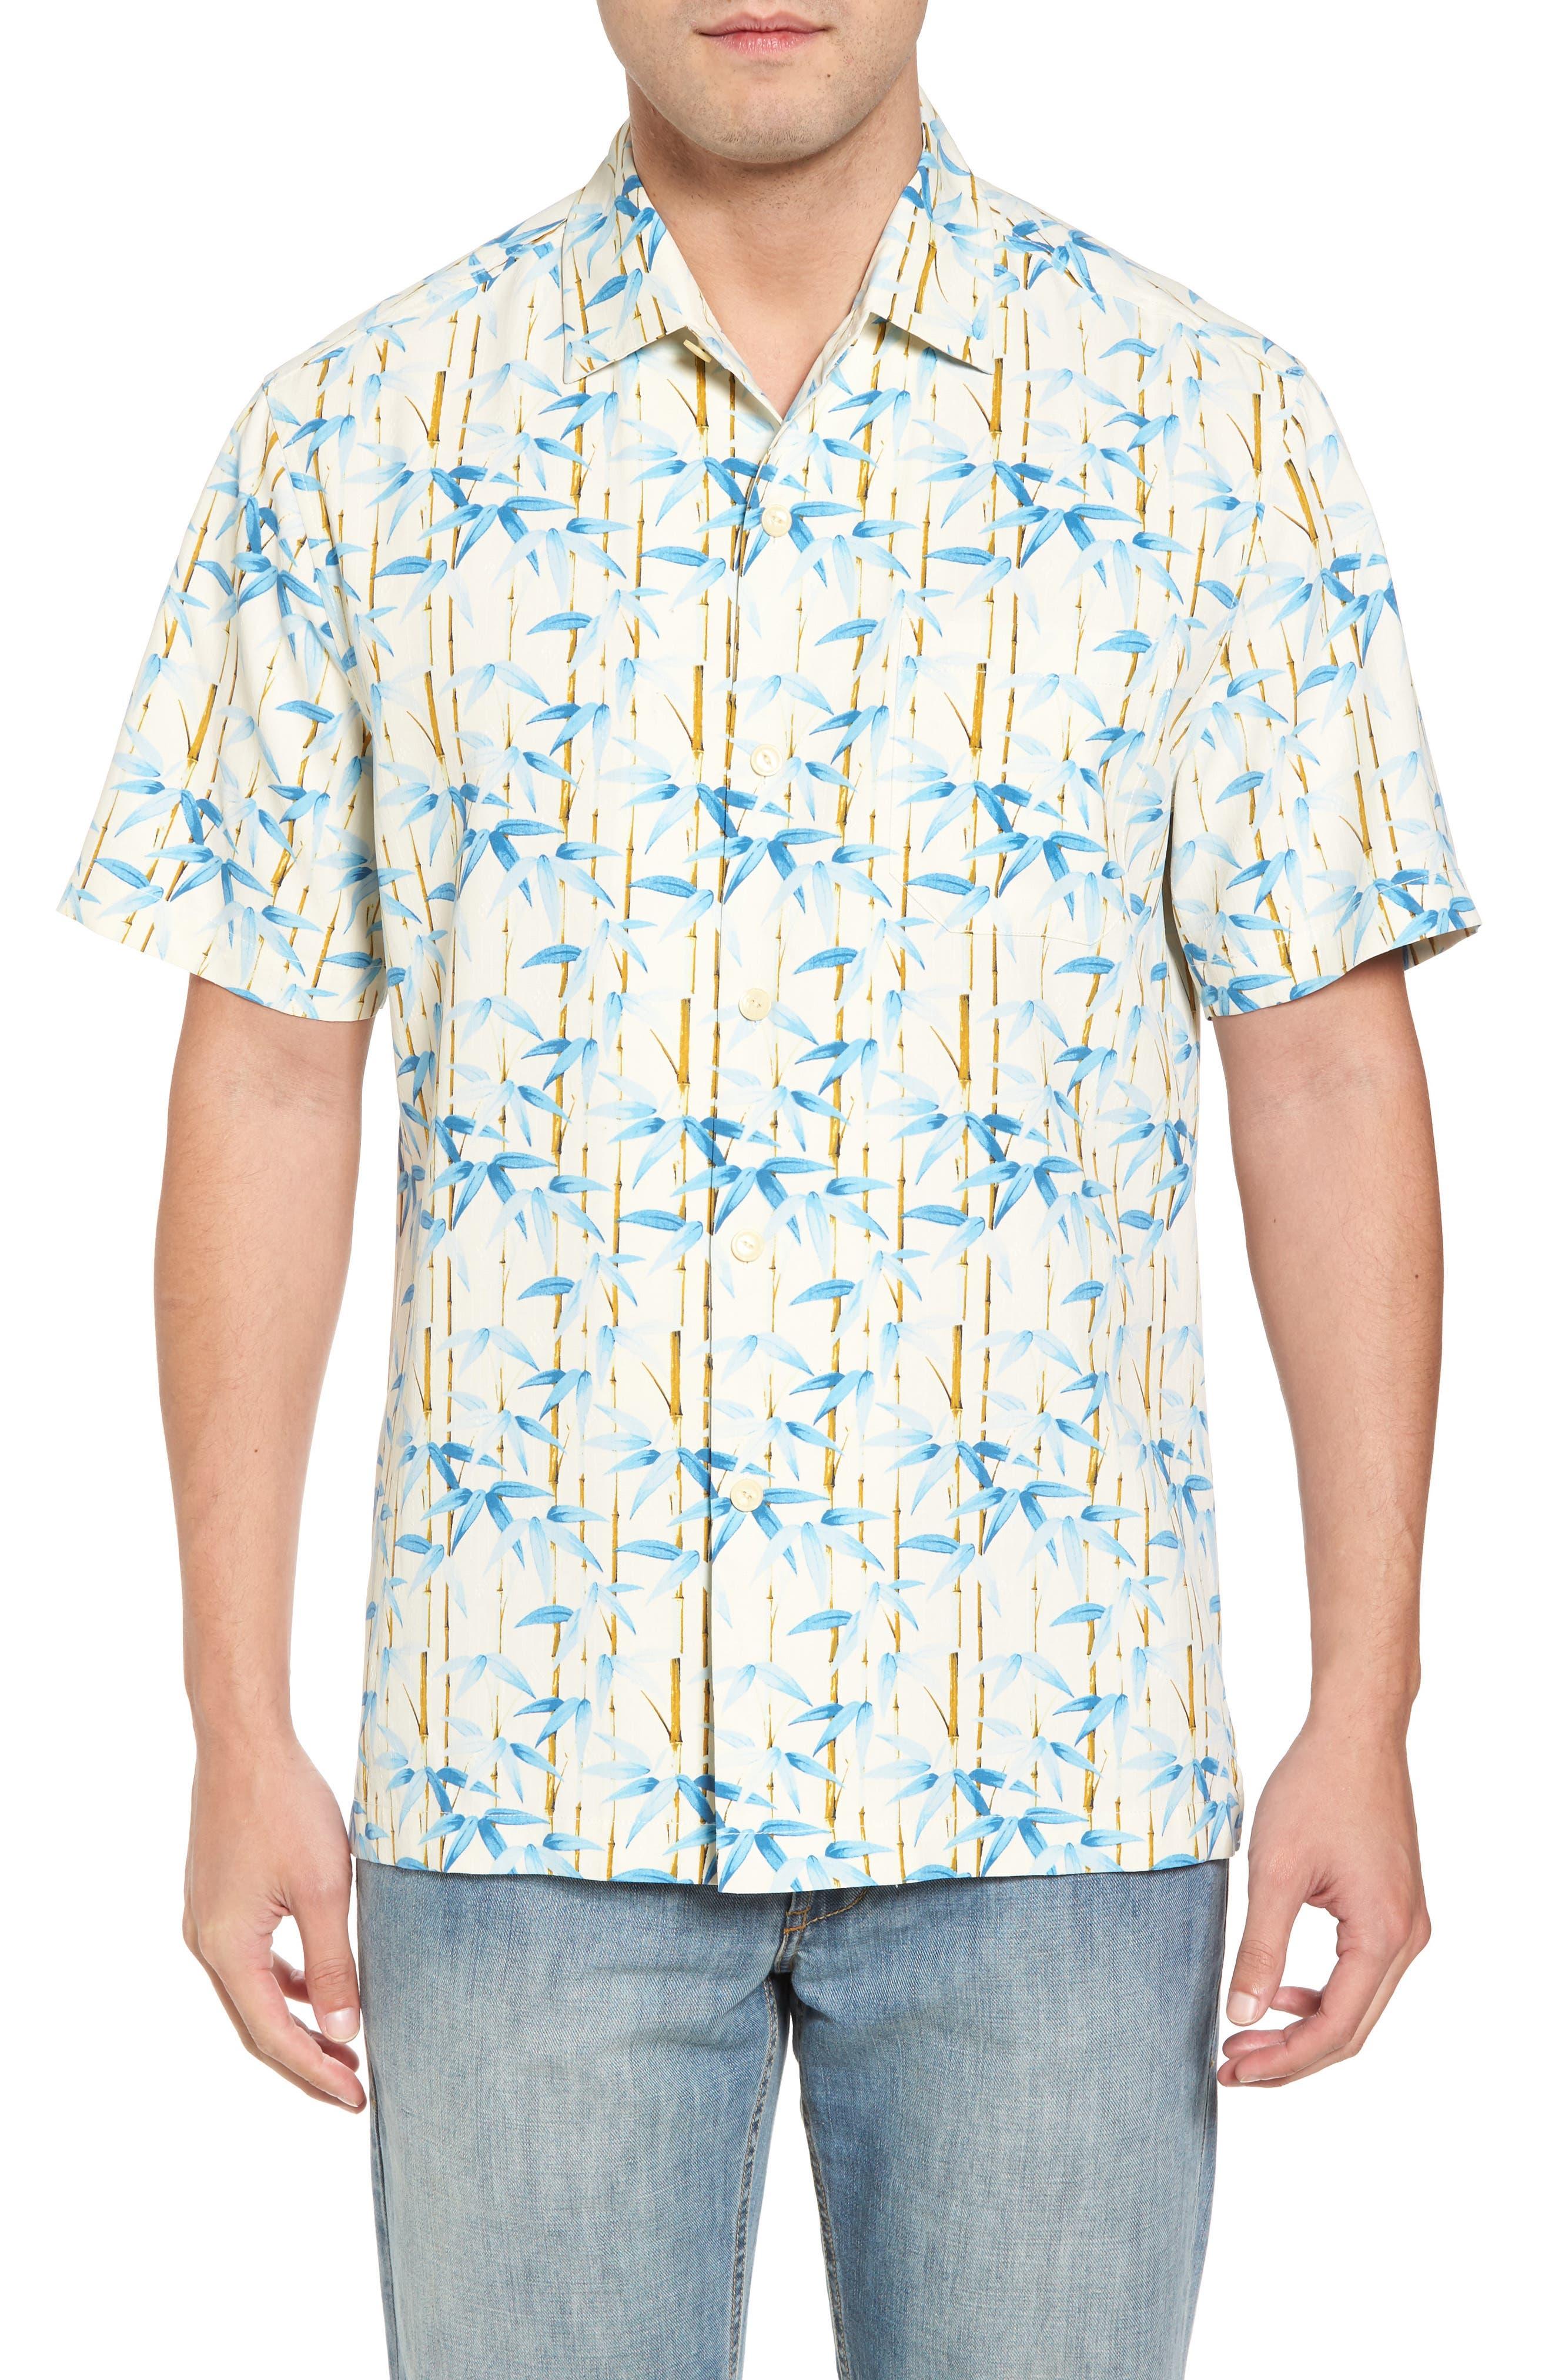 TOMMY BAHAMA,                             Forest Print Silk Sport Shirt,                             Main thumbnail 1, color,                             100